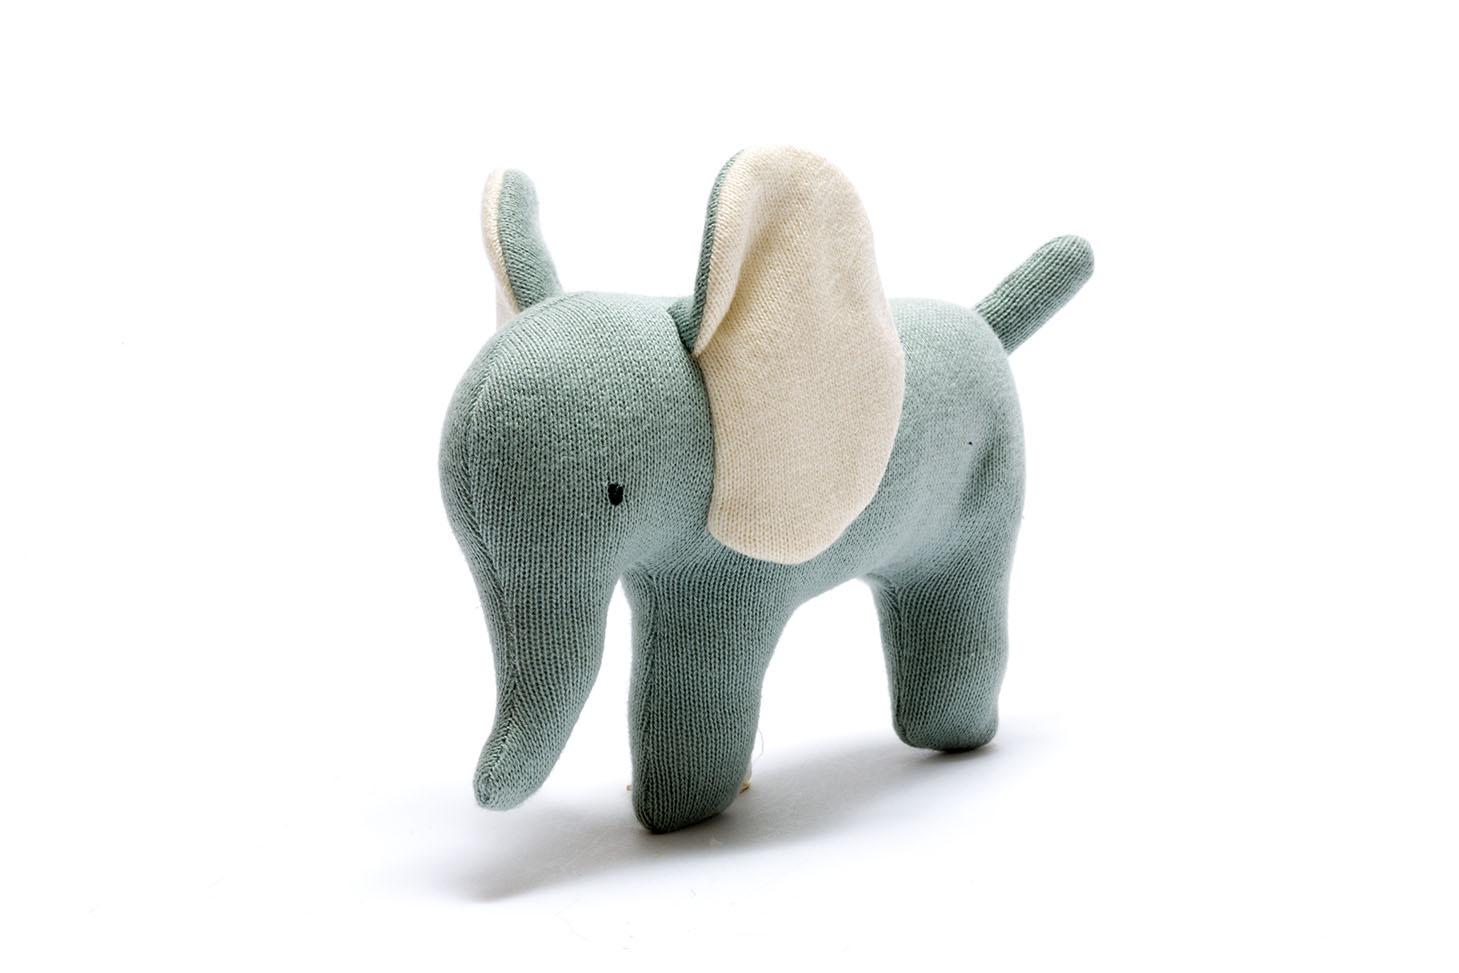 COTTON ORGANIC - SMALL TEAL ORGANIC COTTON ELEPHANT TOY